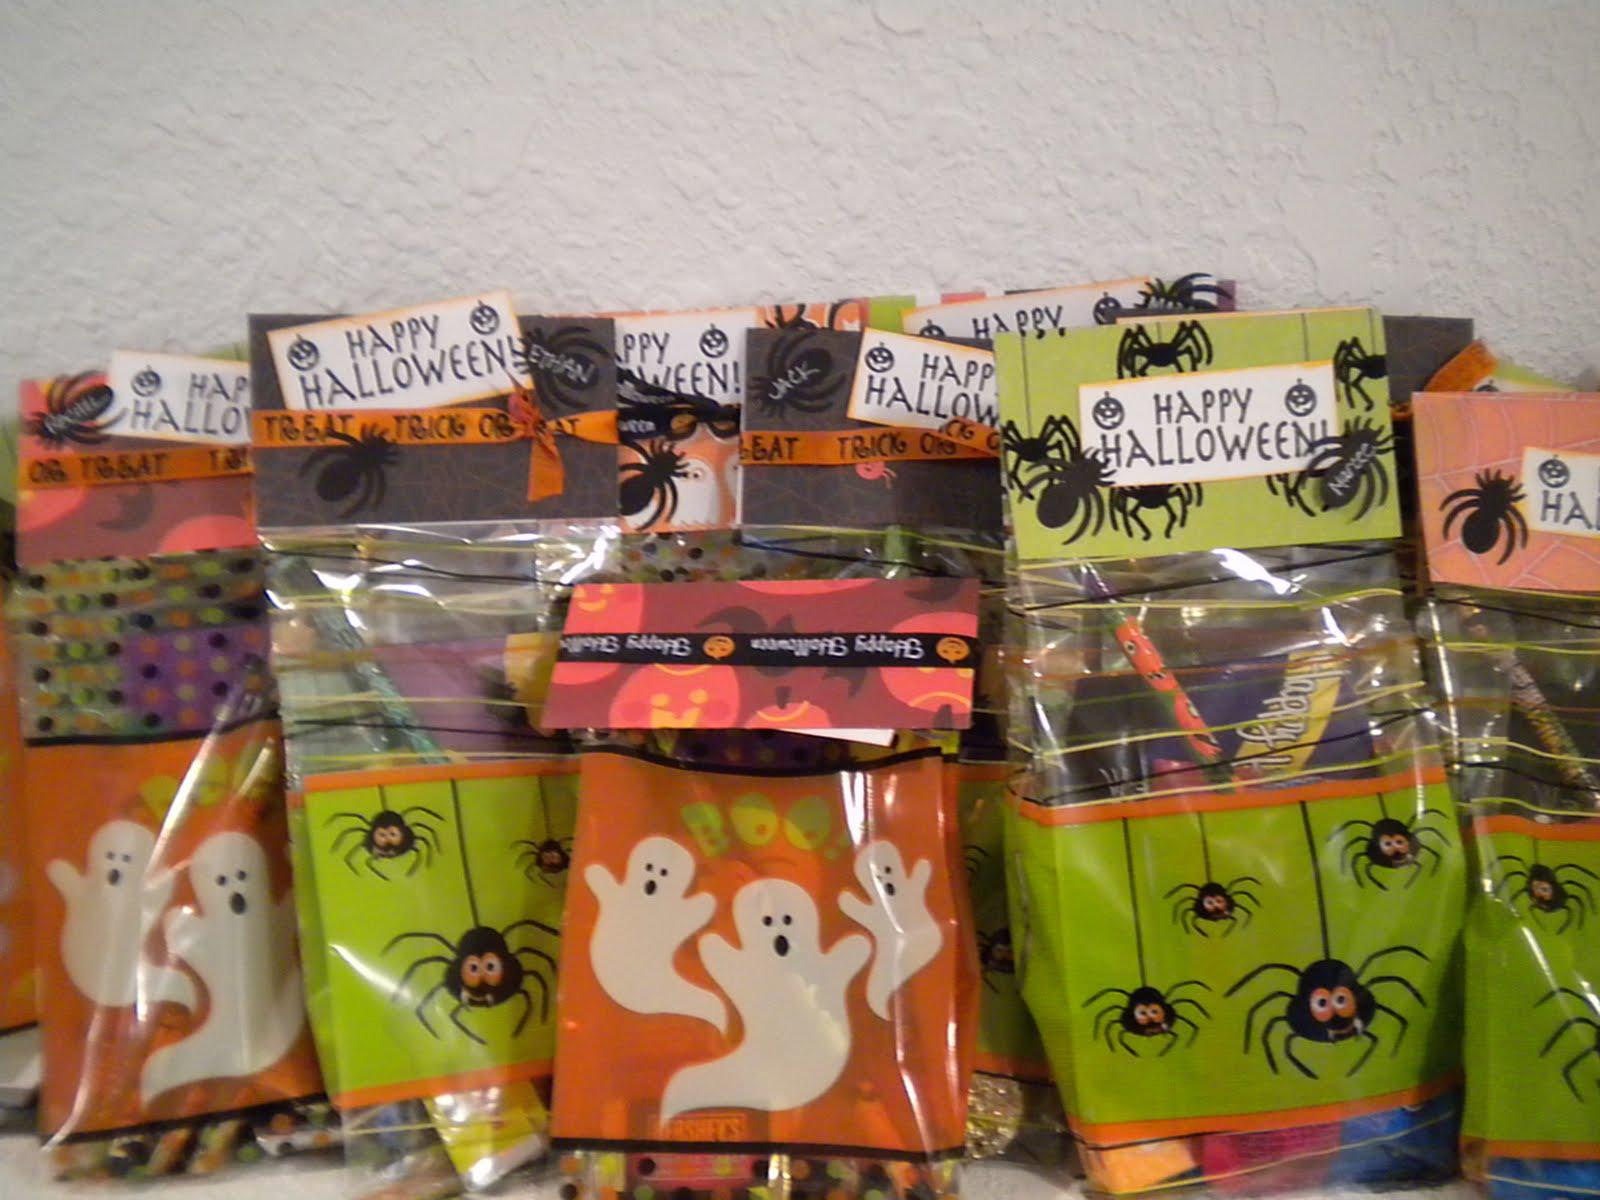 Creative Cricut Designs & More....: Halloween Treat Bags